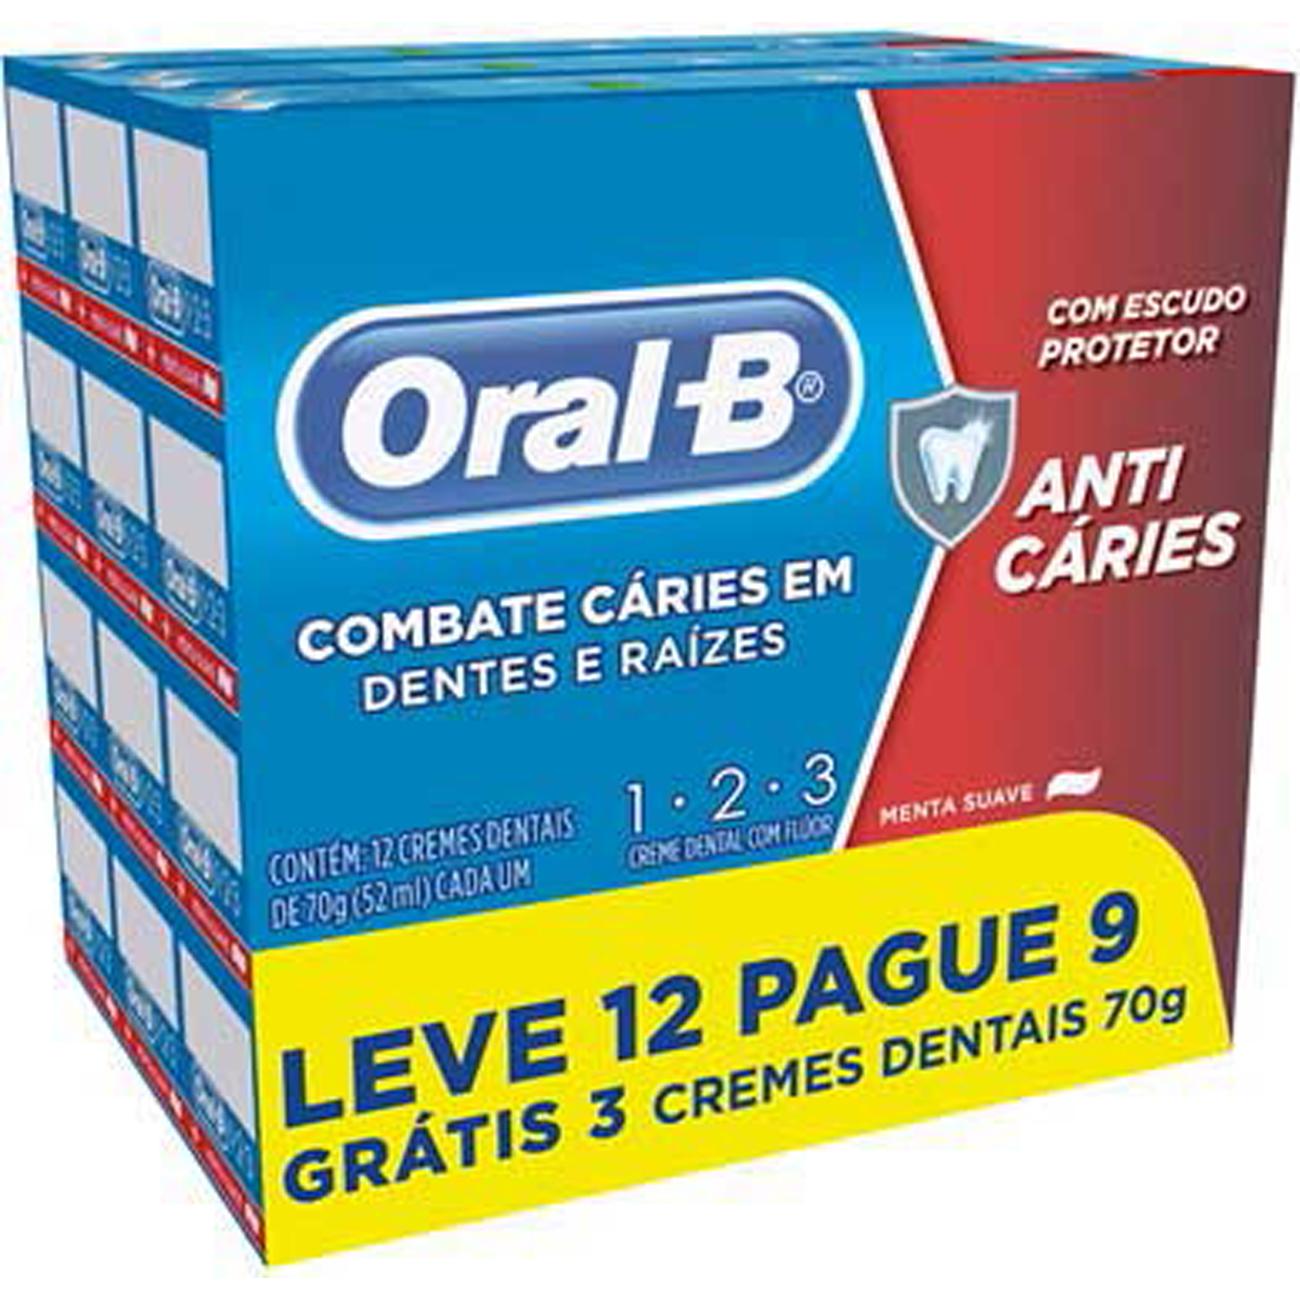 Creme Dental Oral-B 123 70G Lv12 Pg9